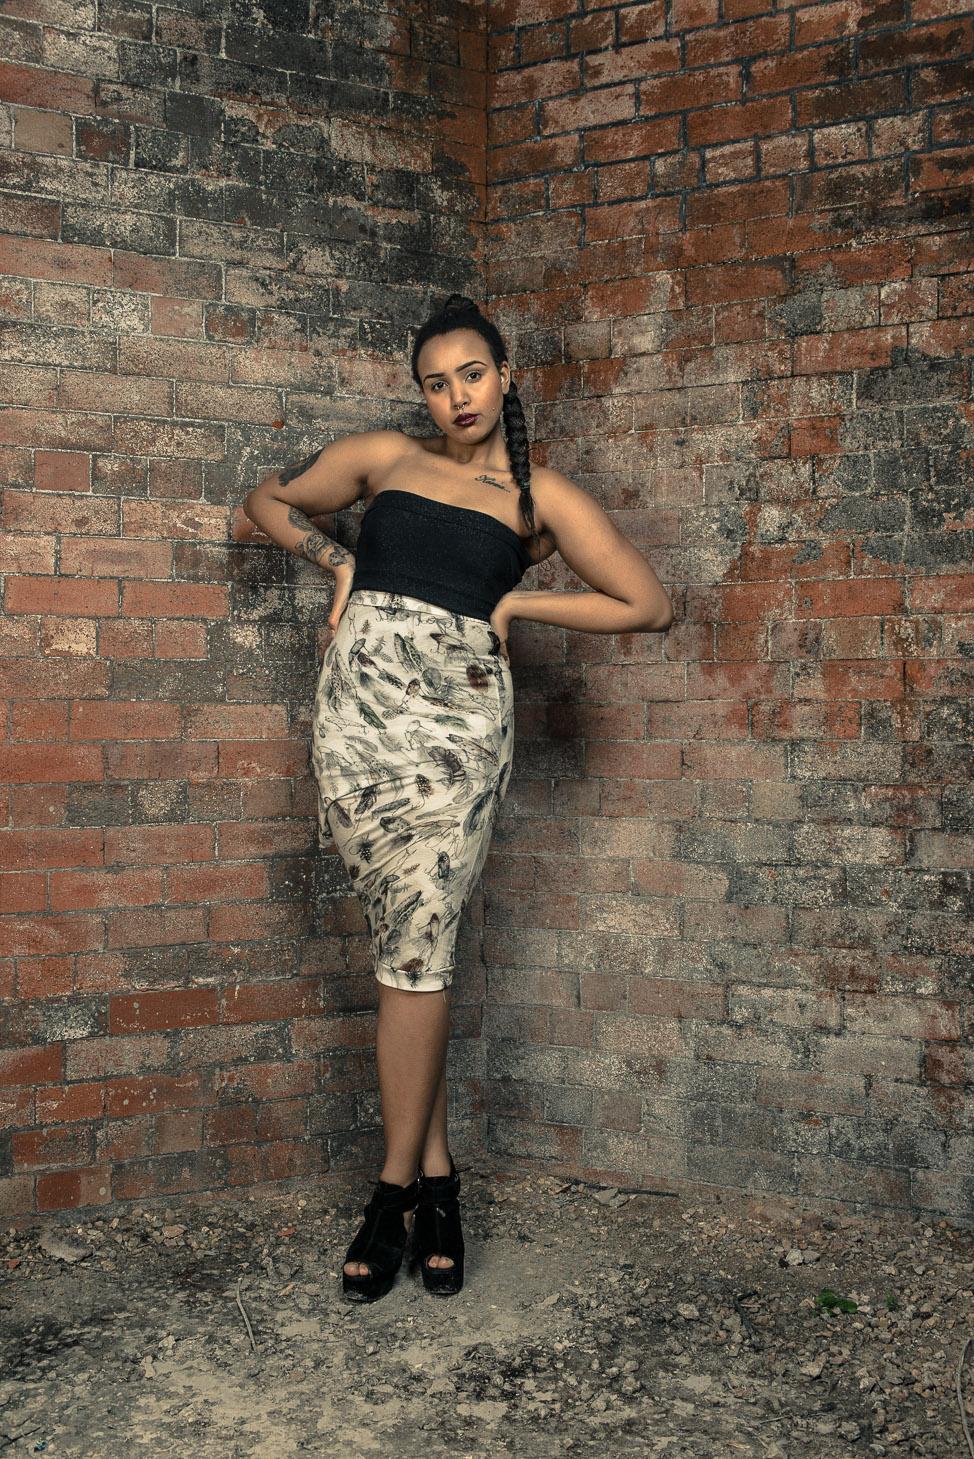 zaramia-ava-zaramiaava-leeds-fashion-designer-ethical-sustainable-tailored-minimalist-skirt-print-bandeau-maxi-versatile-drape-grey-bodysuit-black-obi-belt-wrap-cowl-styling-womenswear-models-37